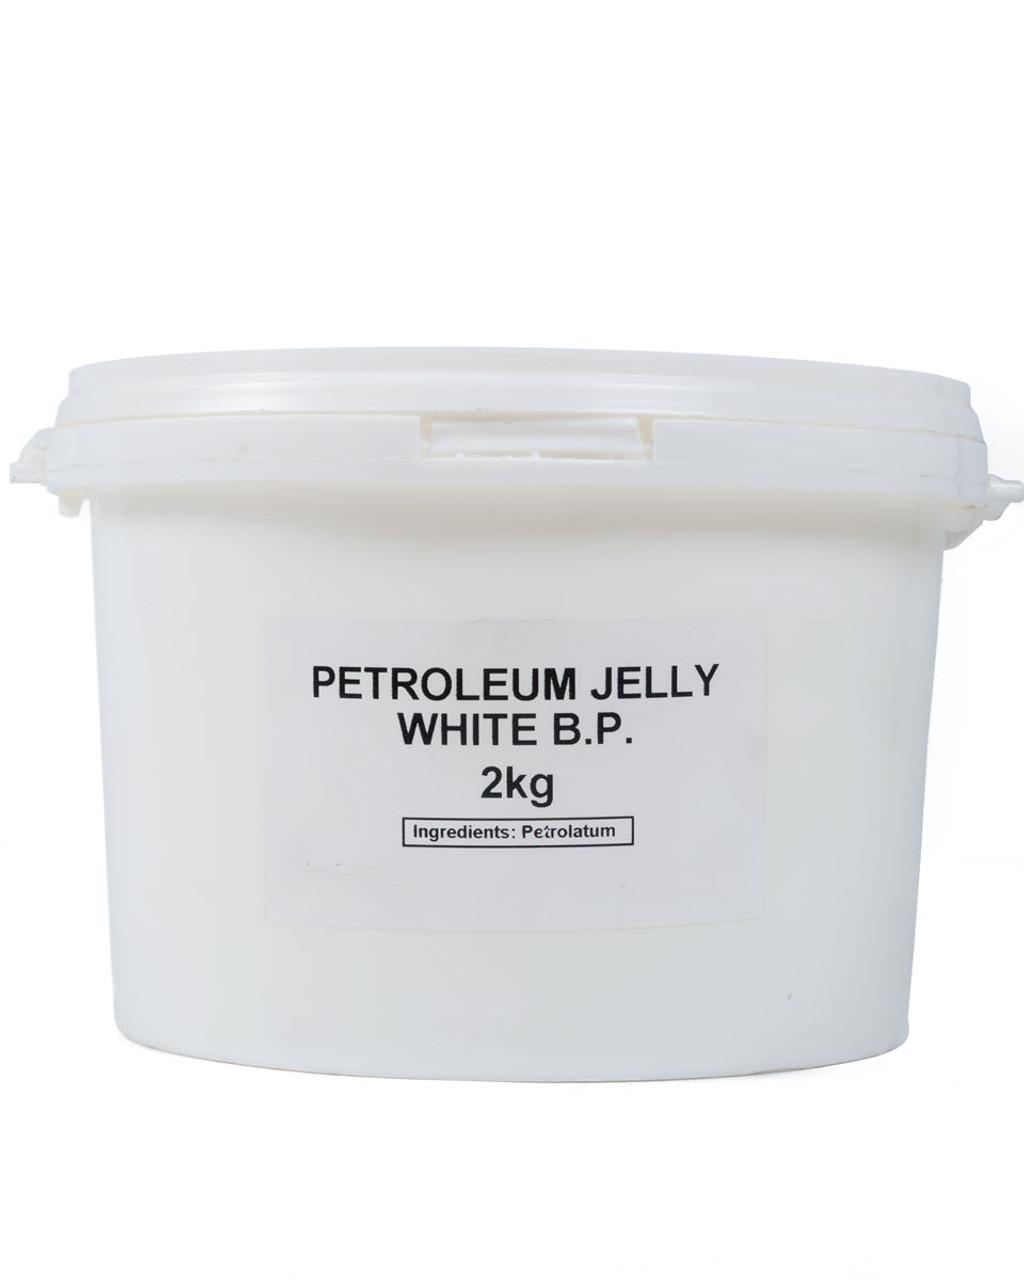 Petroleum Jelly 2kg